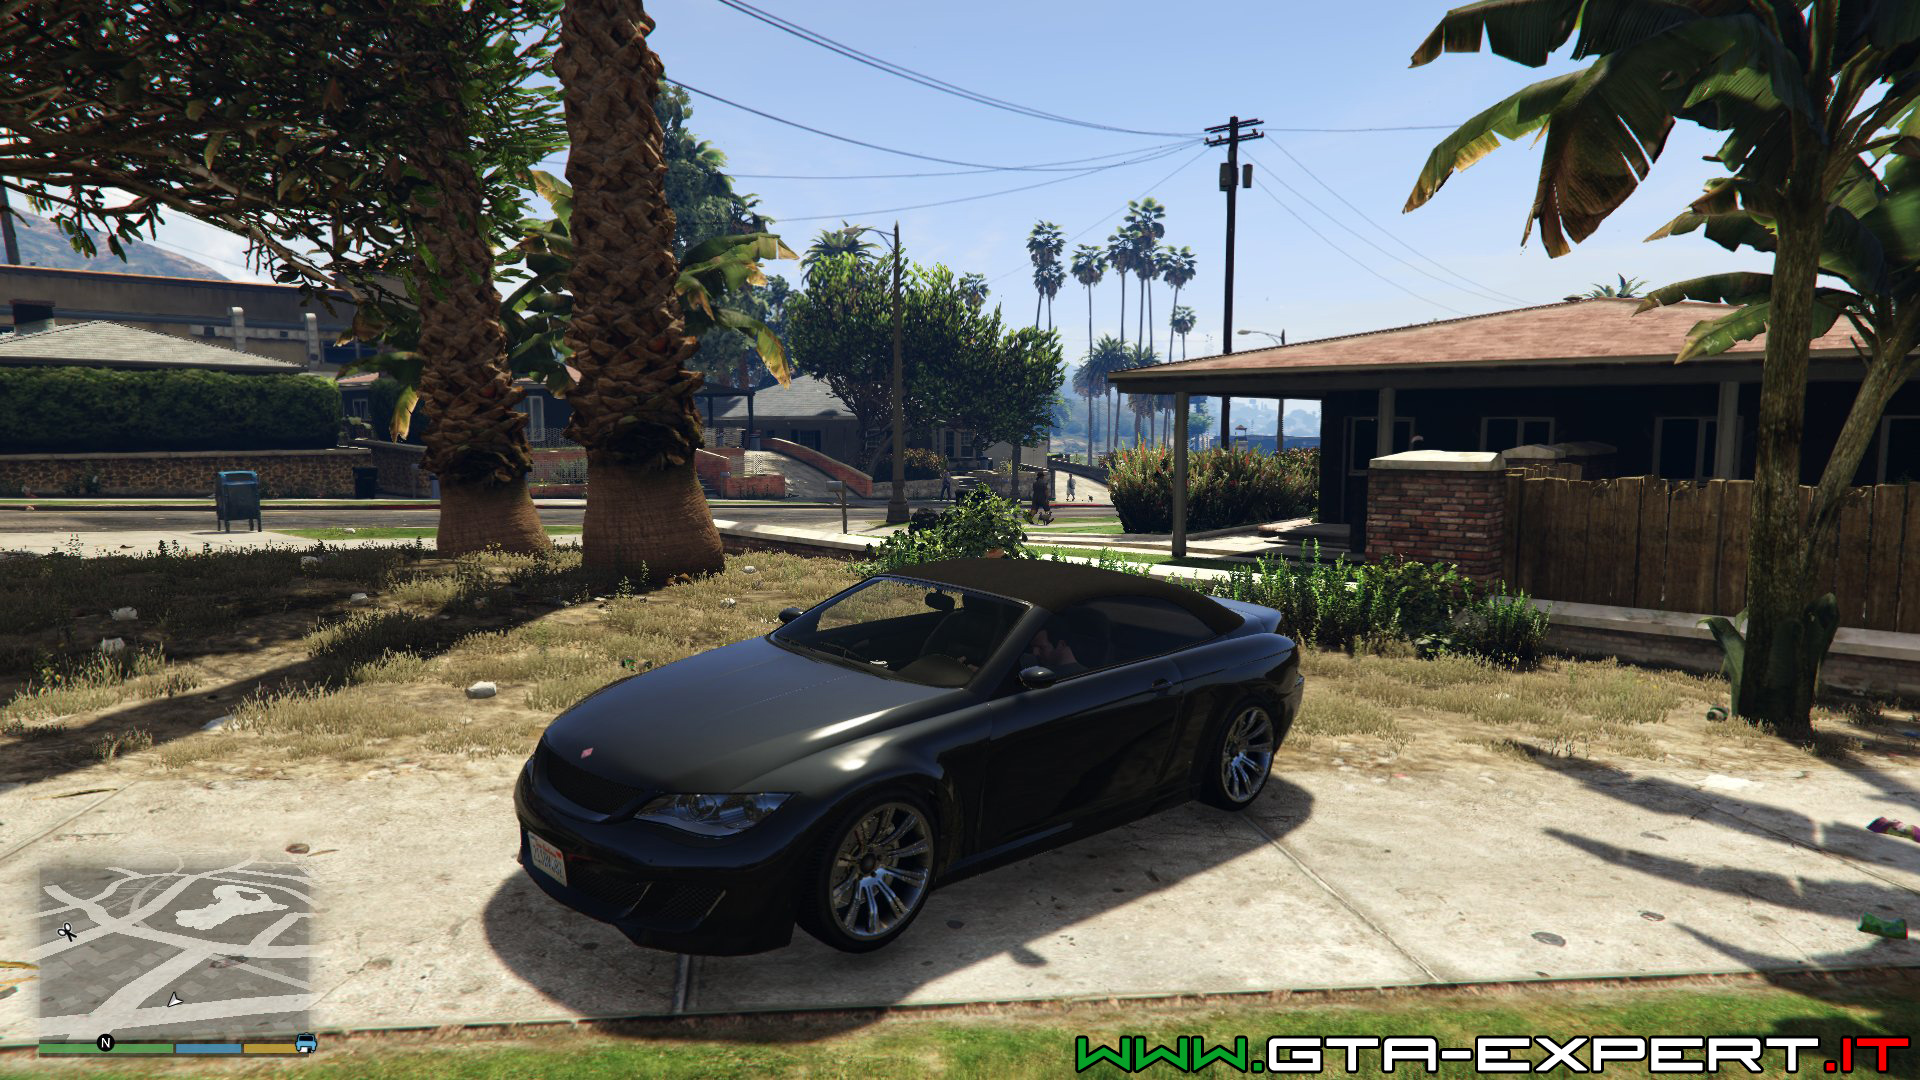 Veicoli della categoria Coupé - GTA V - GTA-Expert Ubermacht Zion Cabrio Gta 5